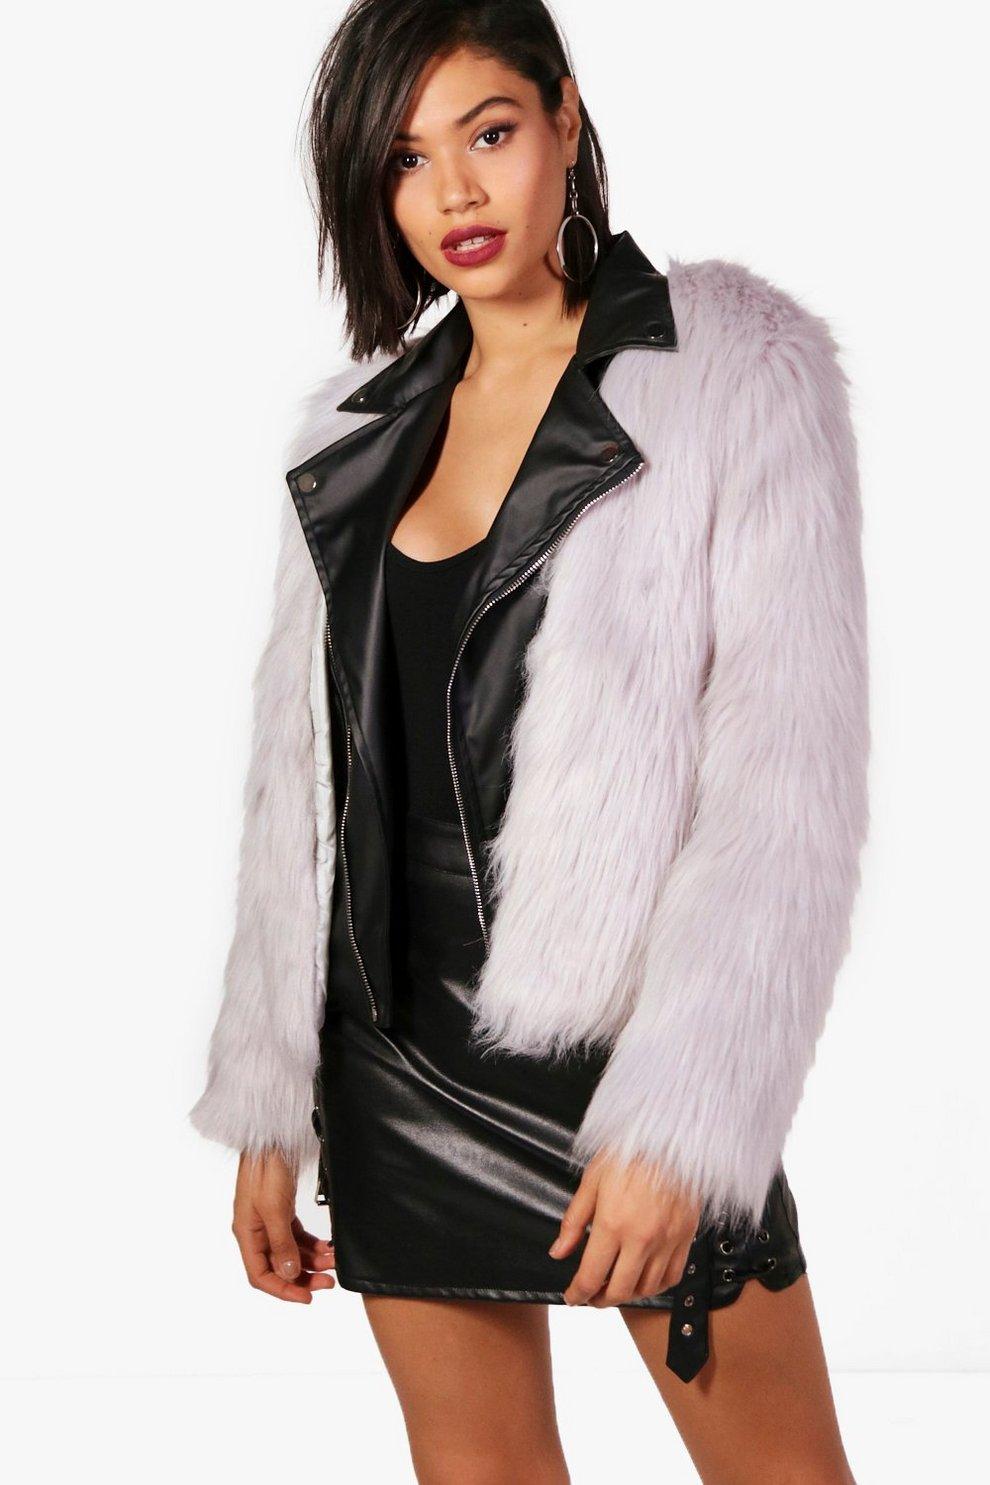 Boohoo Boutique Faux Fur & PU Biker Jacket Cost 1ekubNMpl